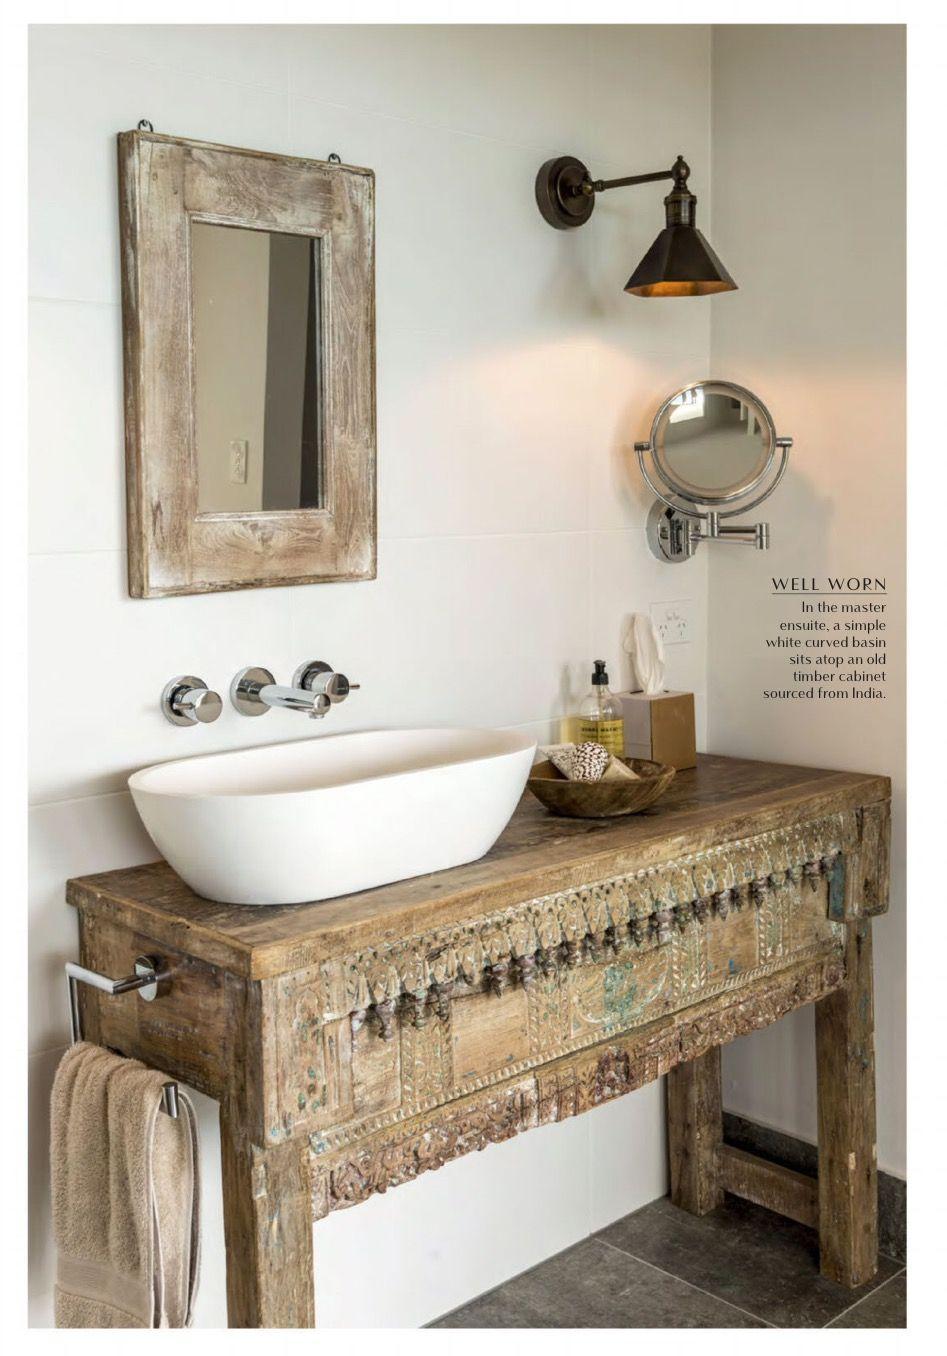 Indian Dresser As Bathroom Vanity From Queensland Homes Boho